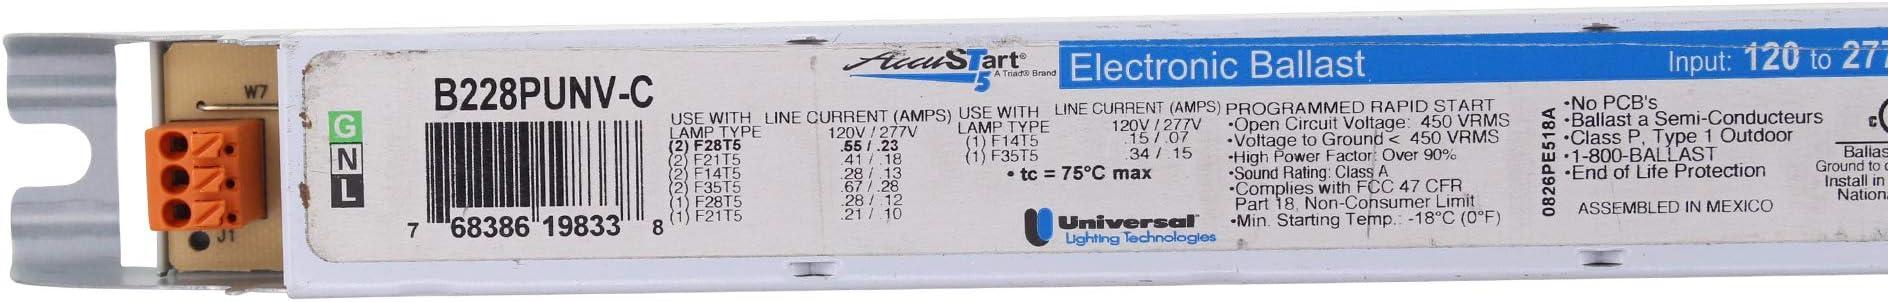 28W T5 UNIVERSAL B228PUNV-C ELECTRONIC FLUORESCENT BALLAST 120//277V 2 LAMP